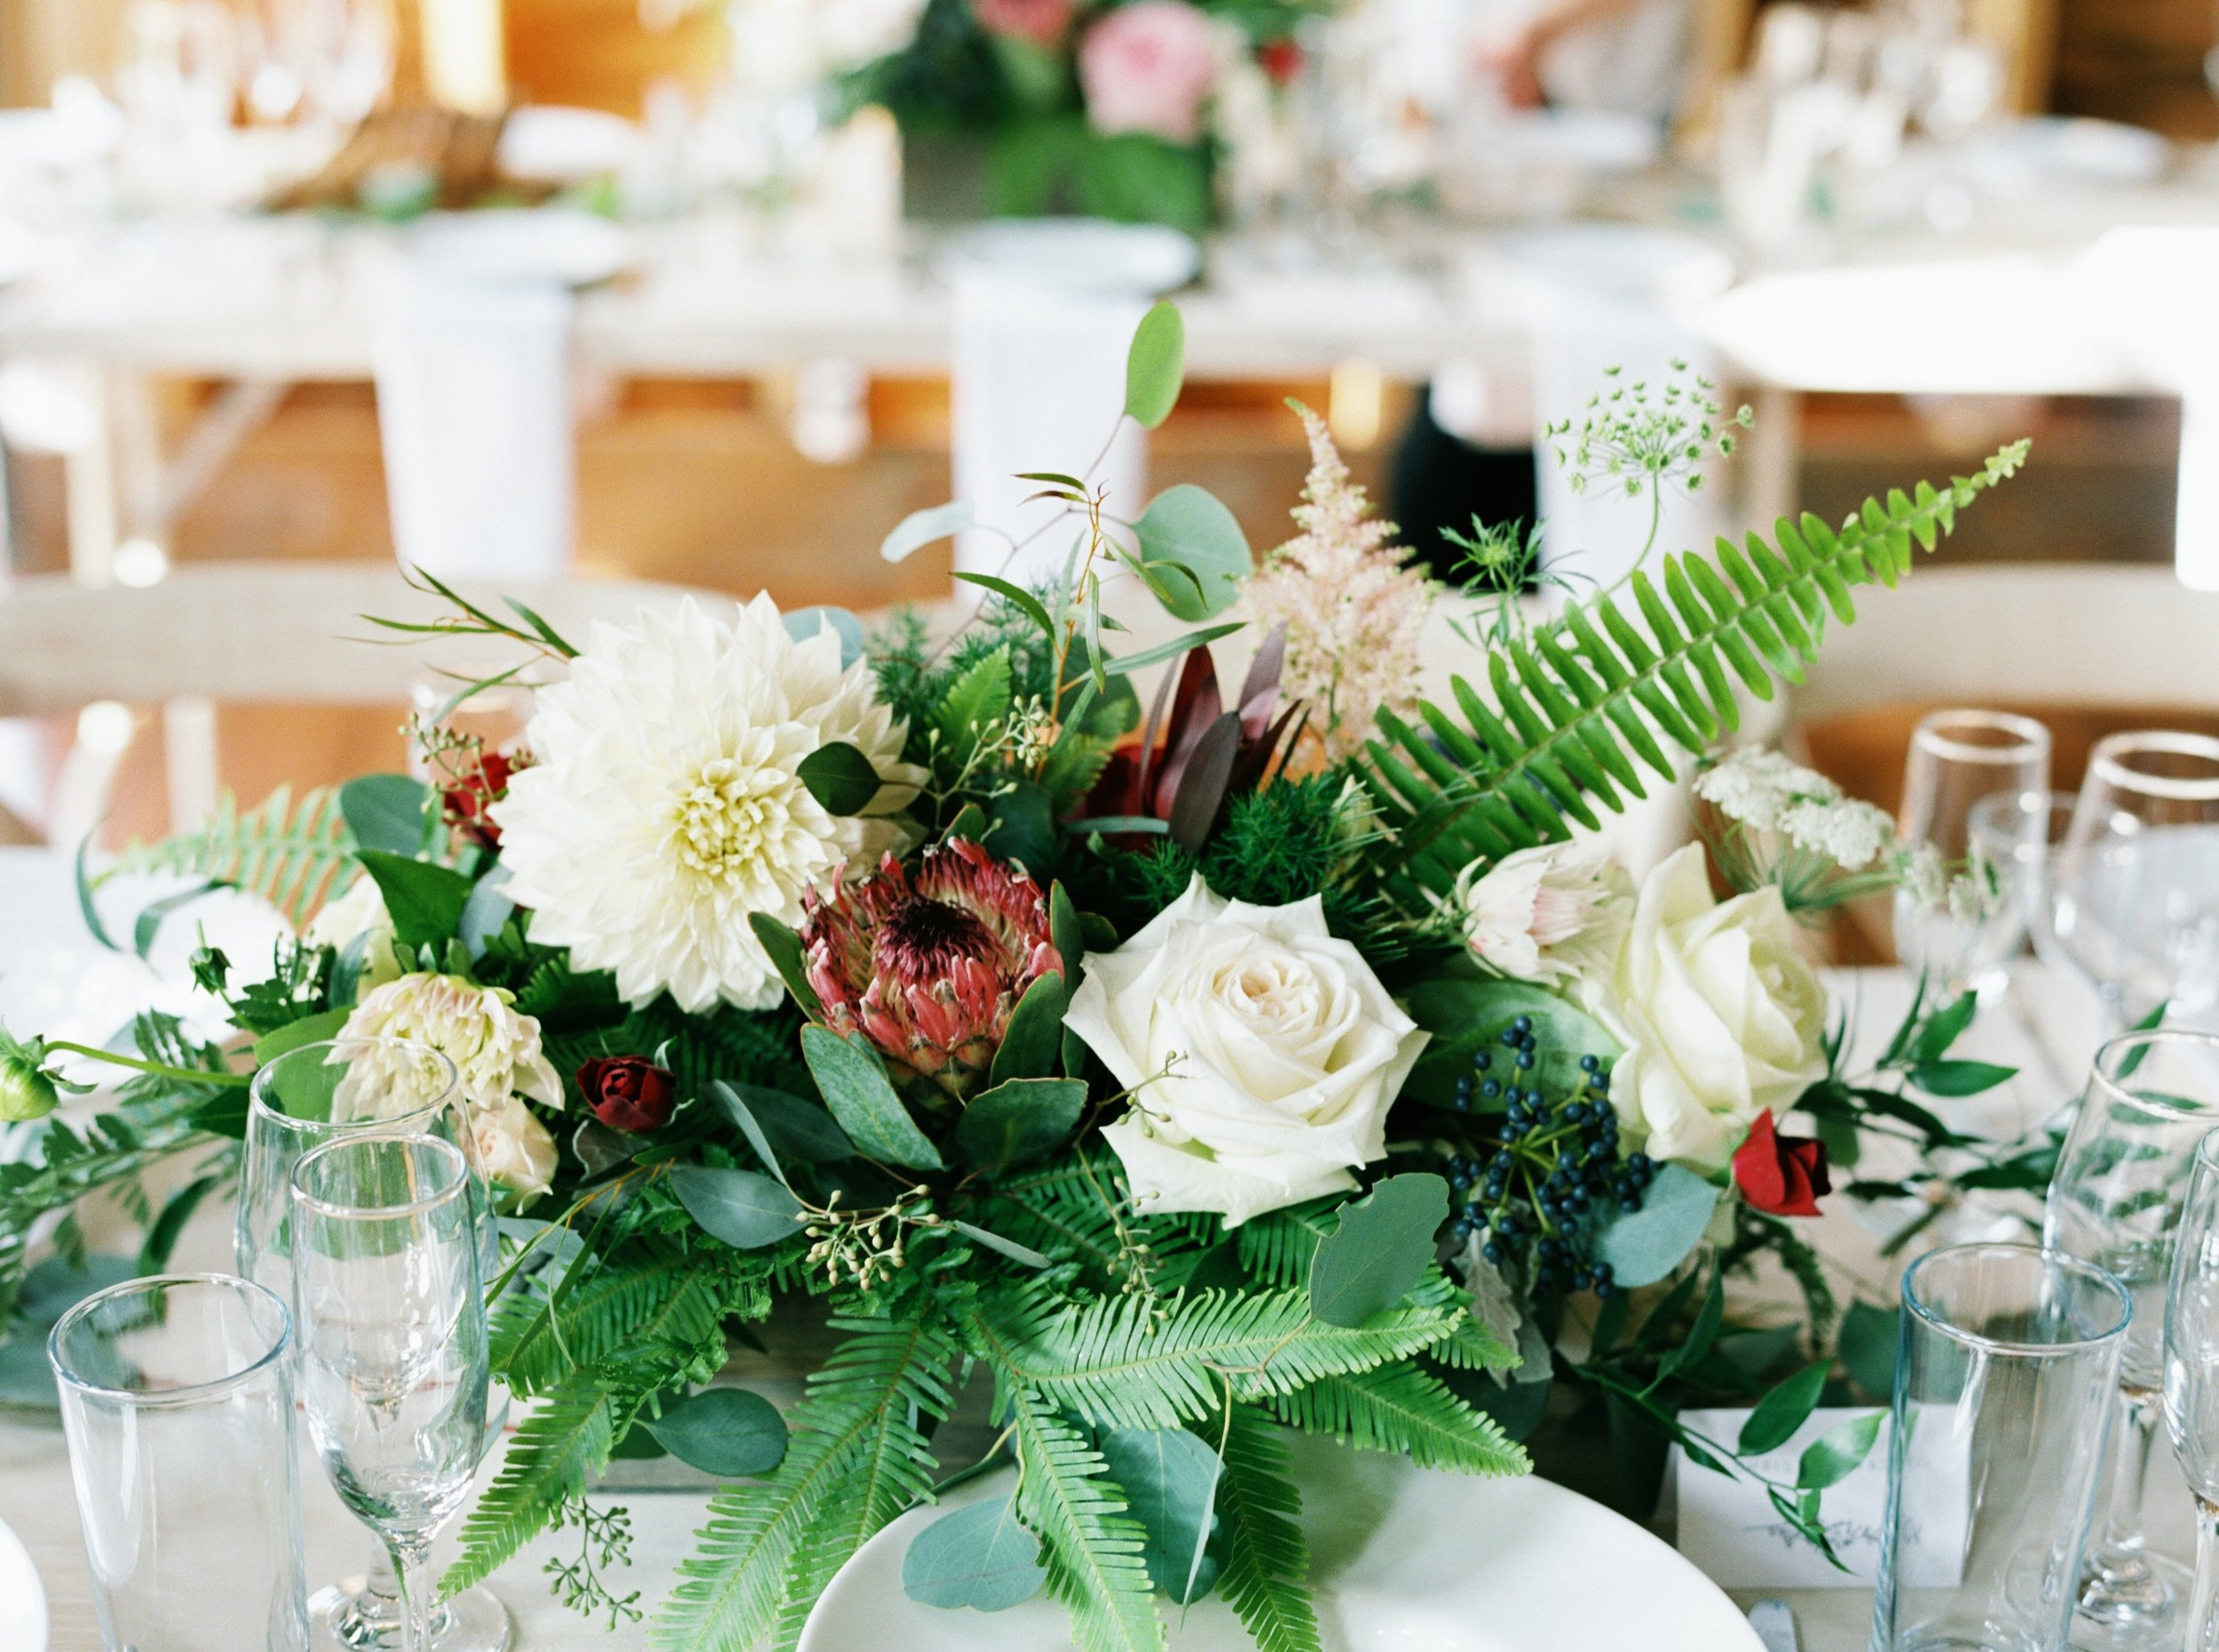 Courtney + Matt Blenheim Hill Farm Catskills NY Wedding Veronica Lola Photography 2017-326.jpg